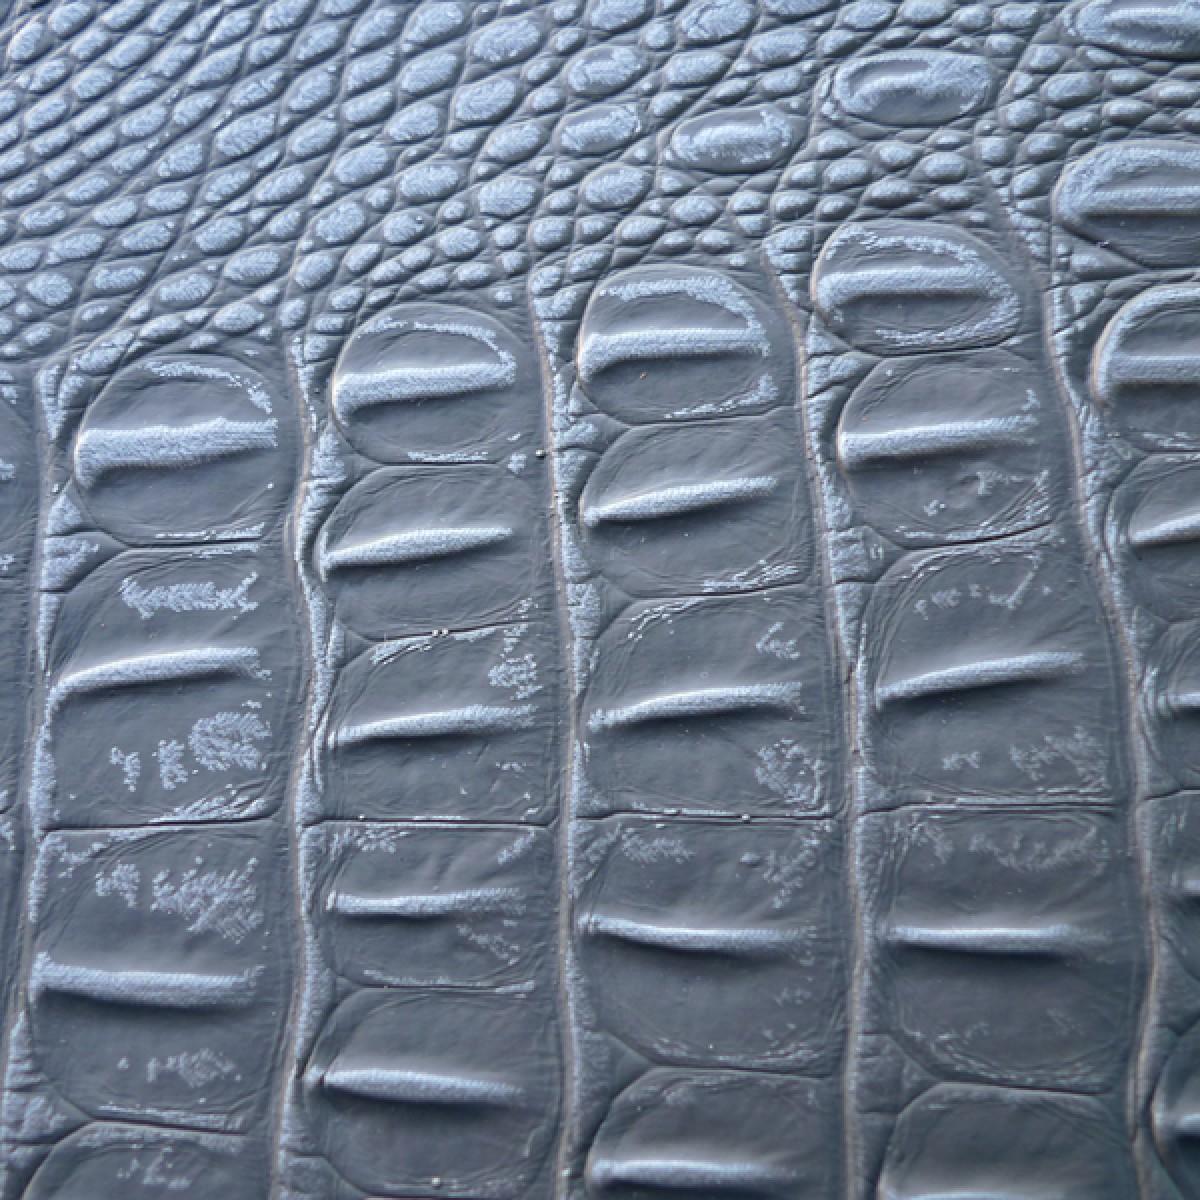 #076 Silver/Grey Croc